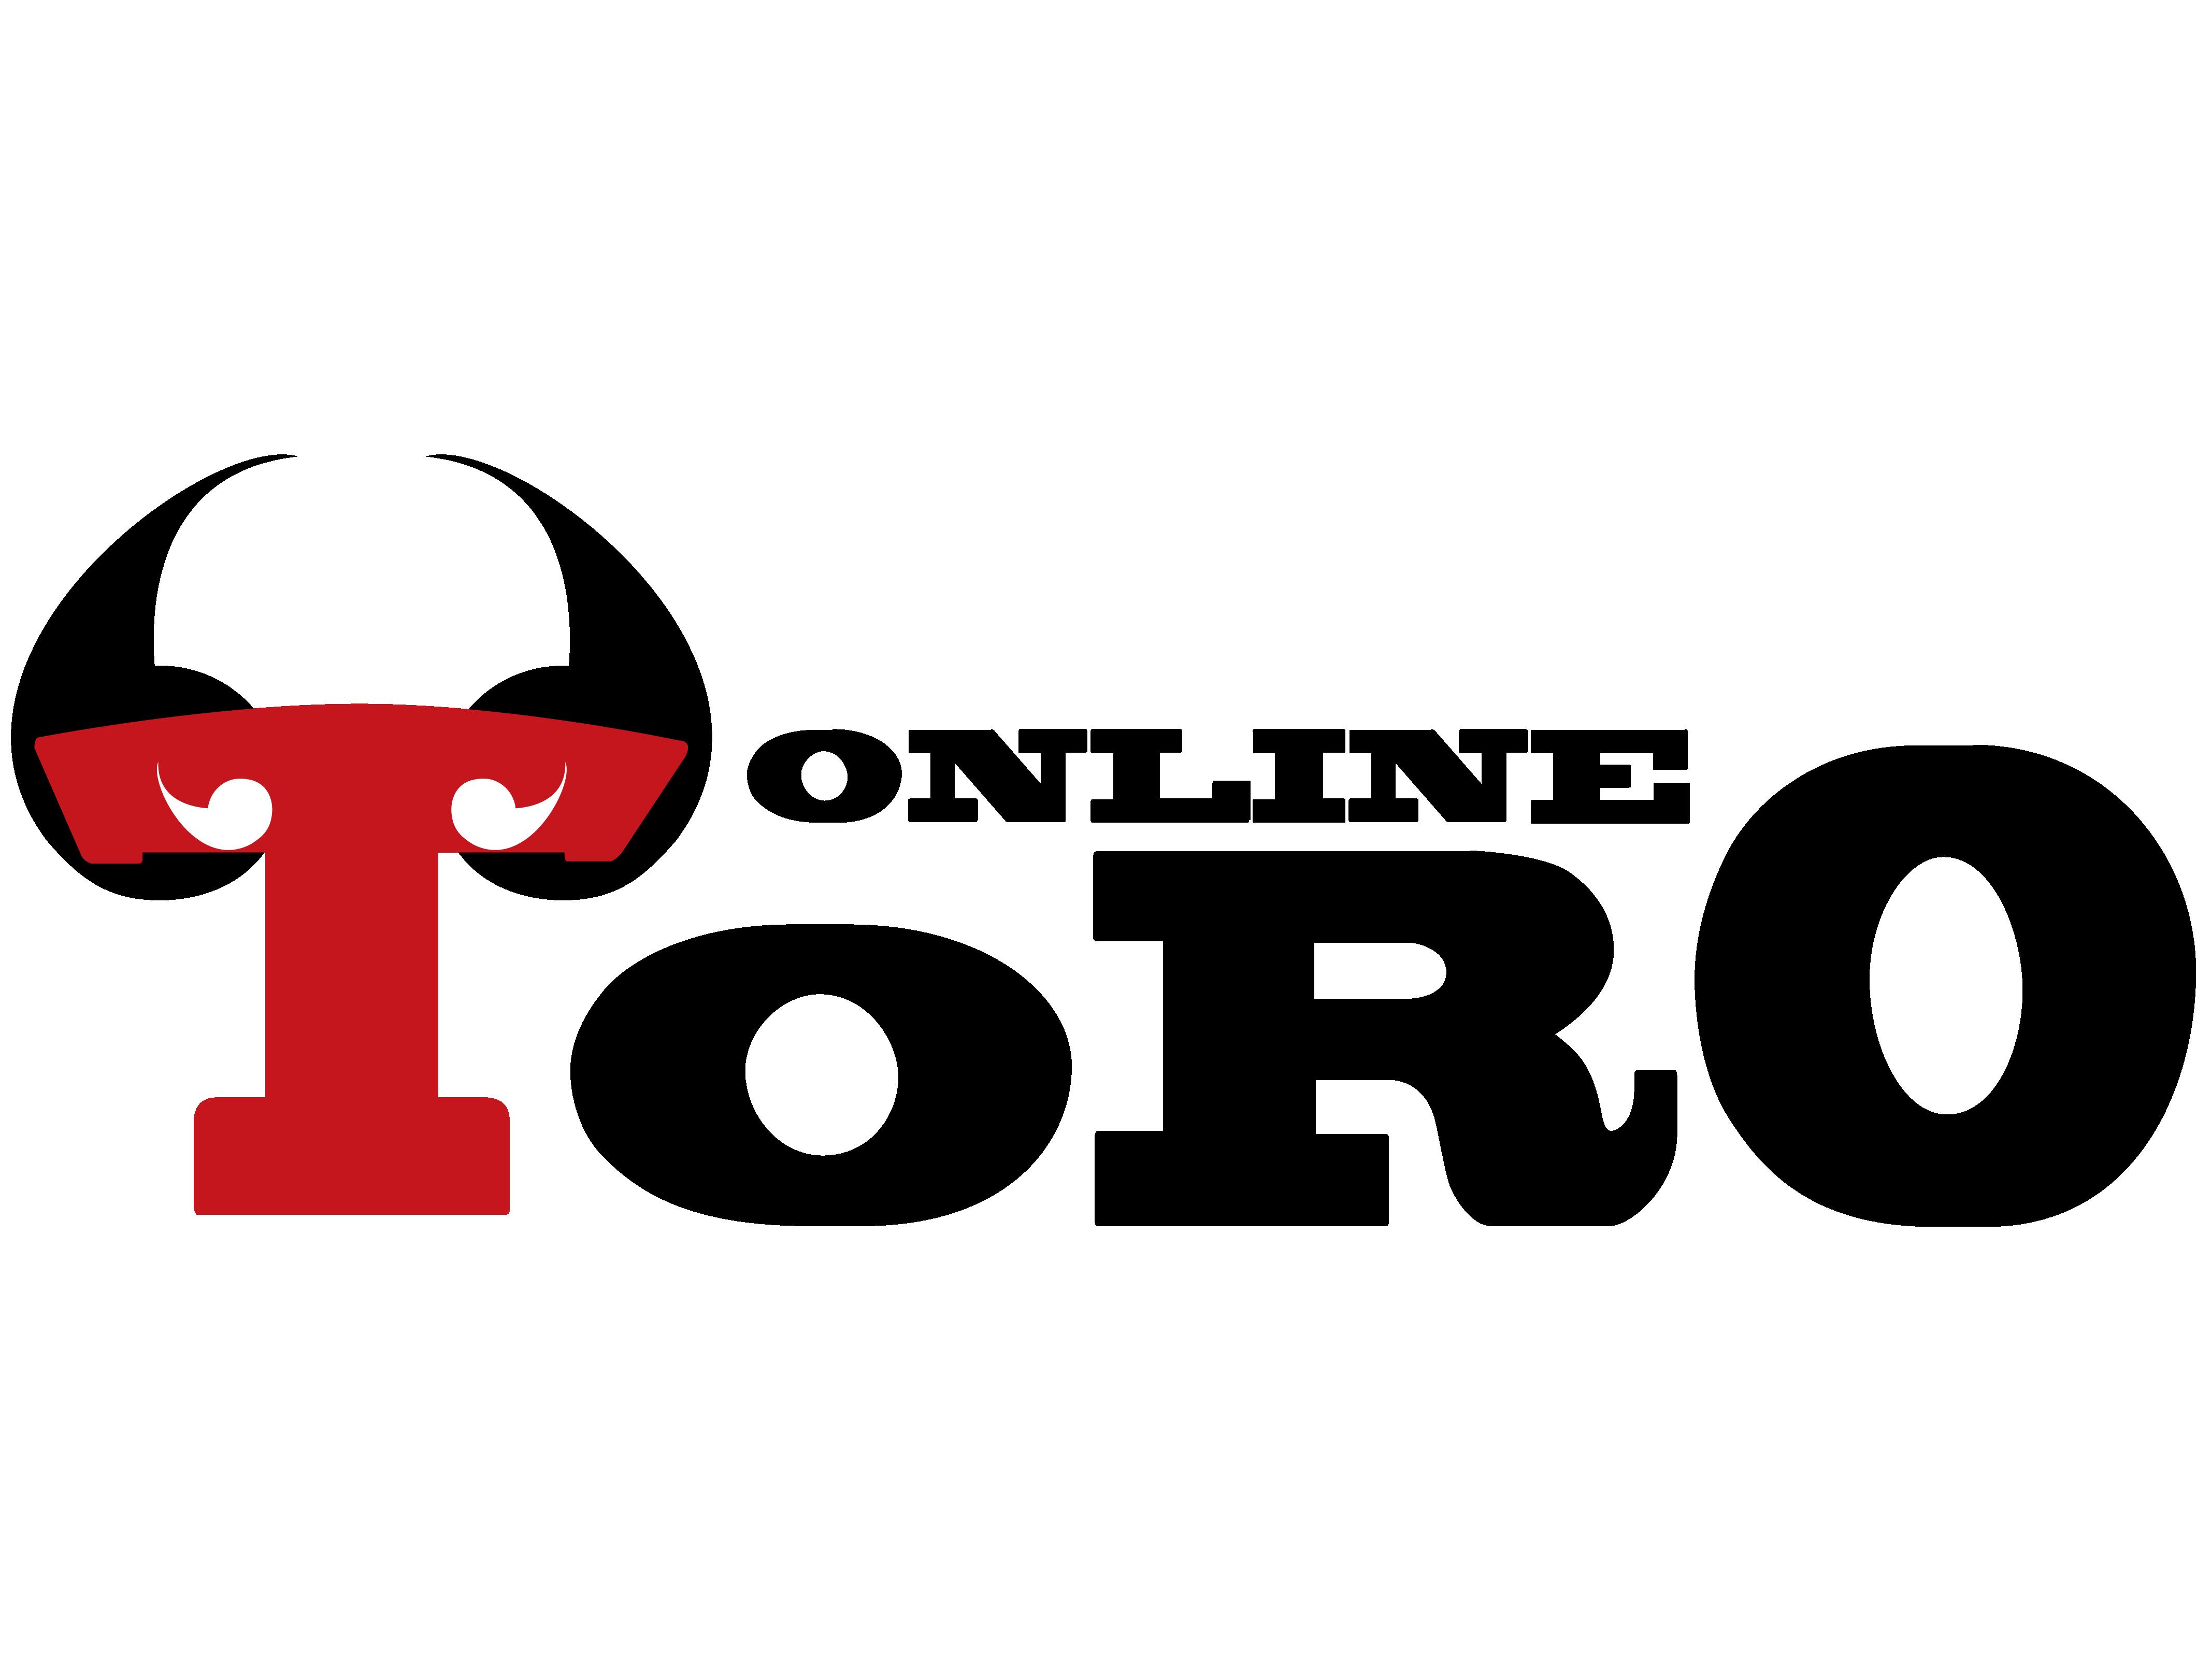 /images/com_odtatierkdunaju/teams/2017_ONLINE-TORO.png